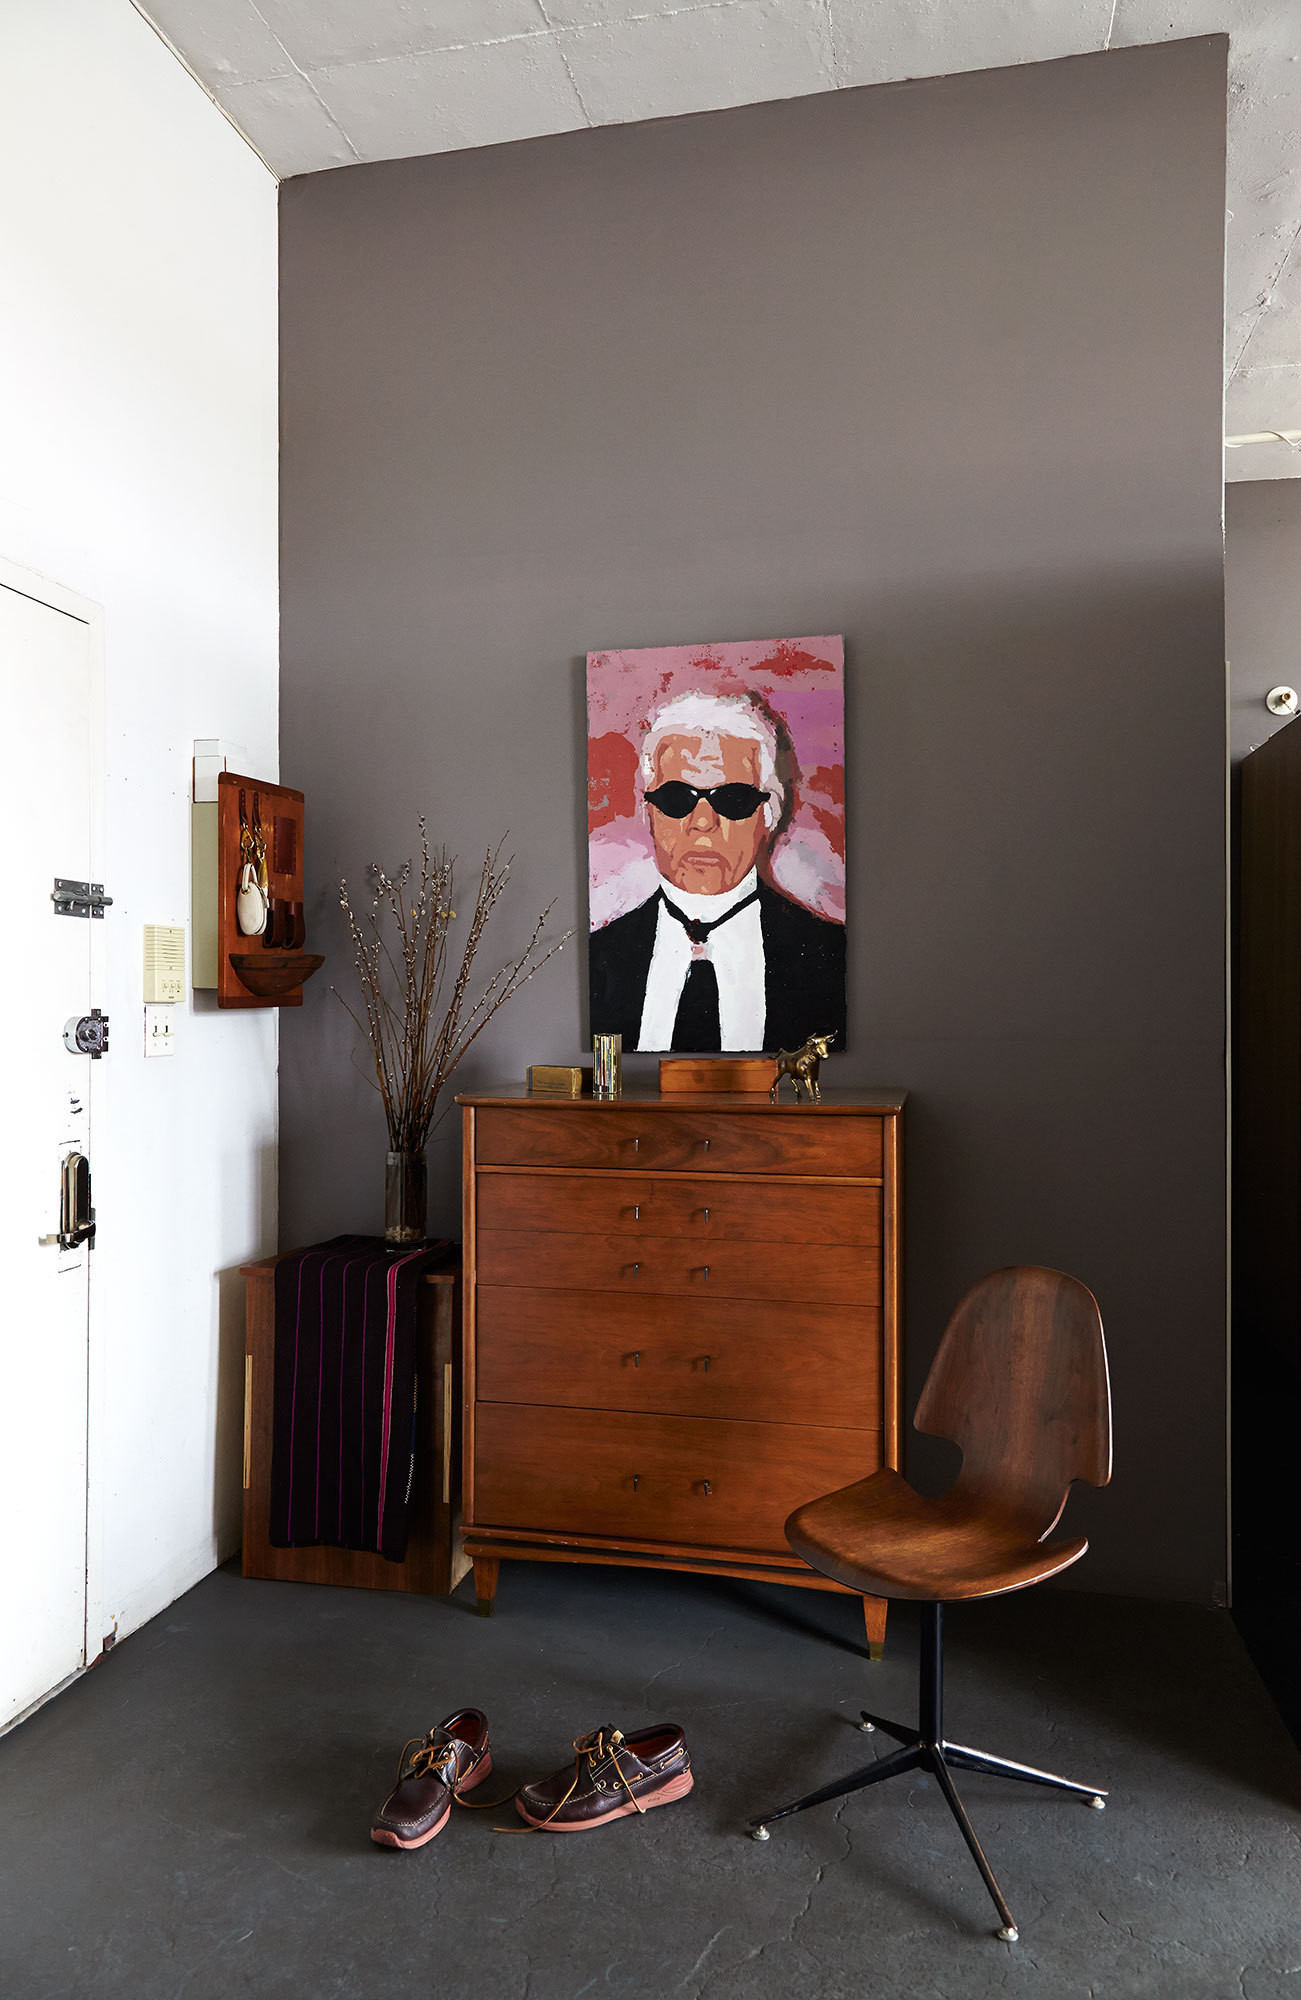 Le mini-loft d'Adam Davidson à Brooklyn